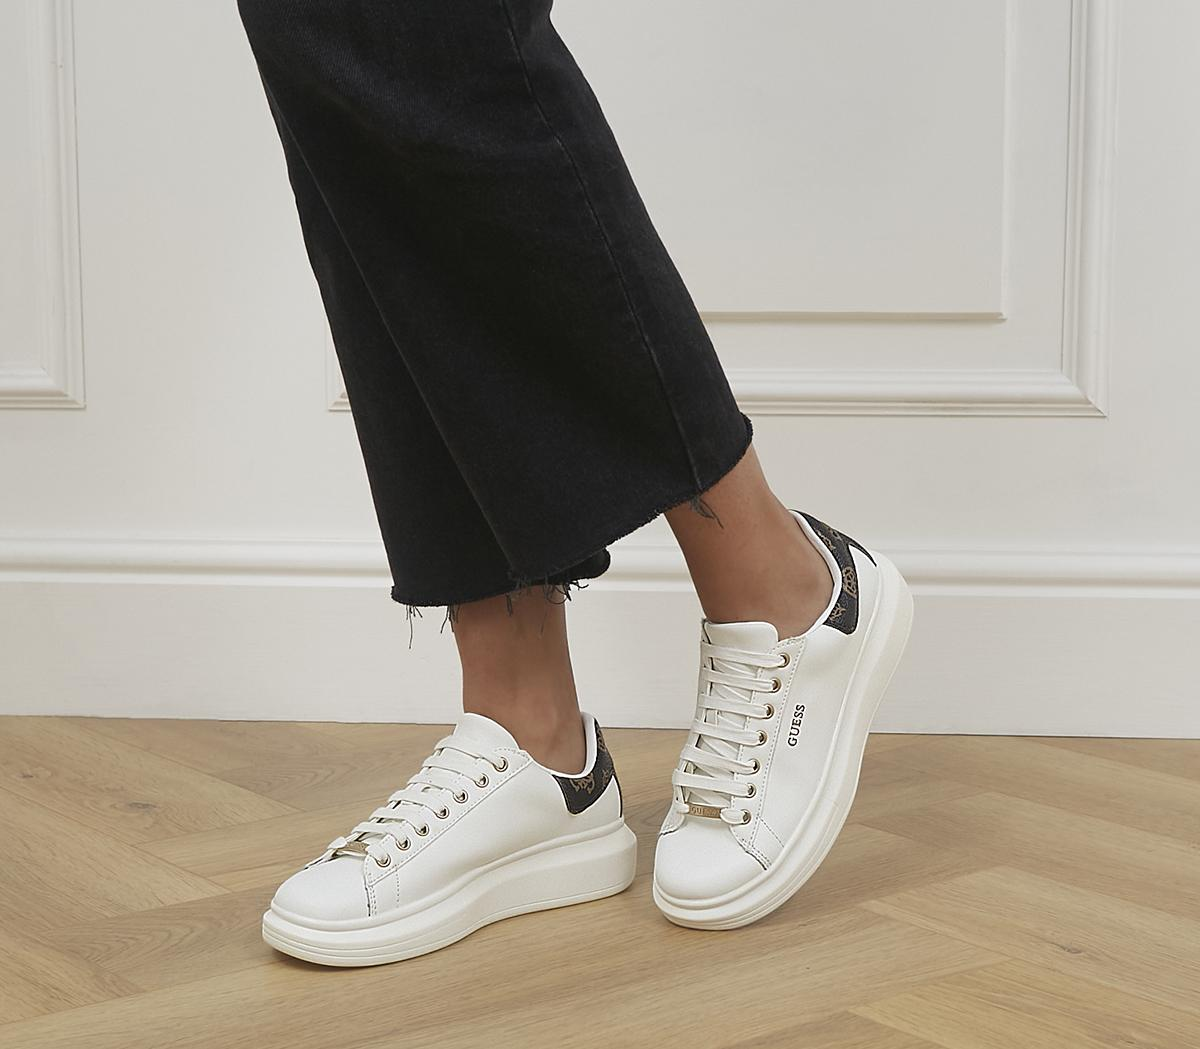 Salerno Sneakers